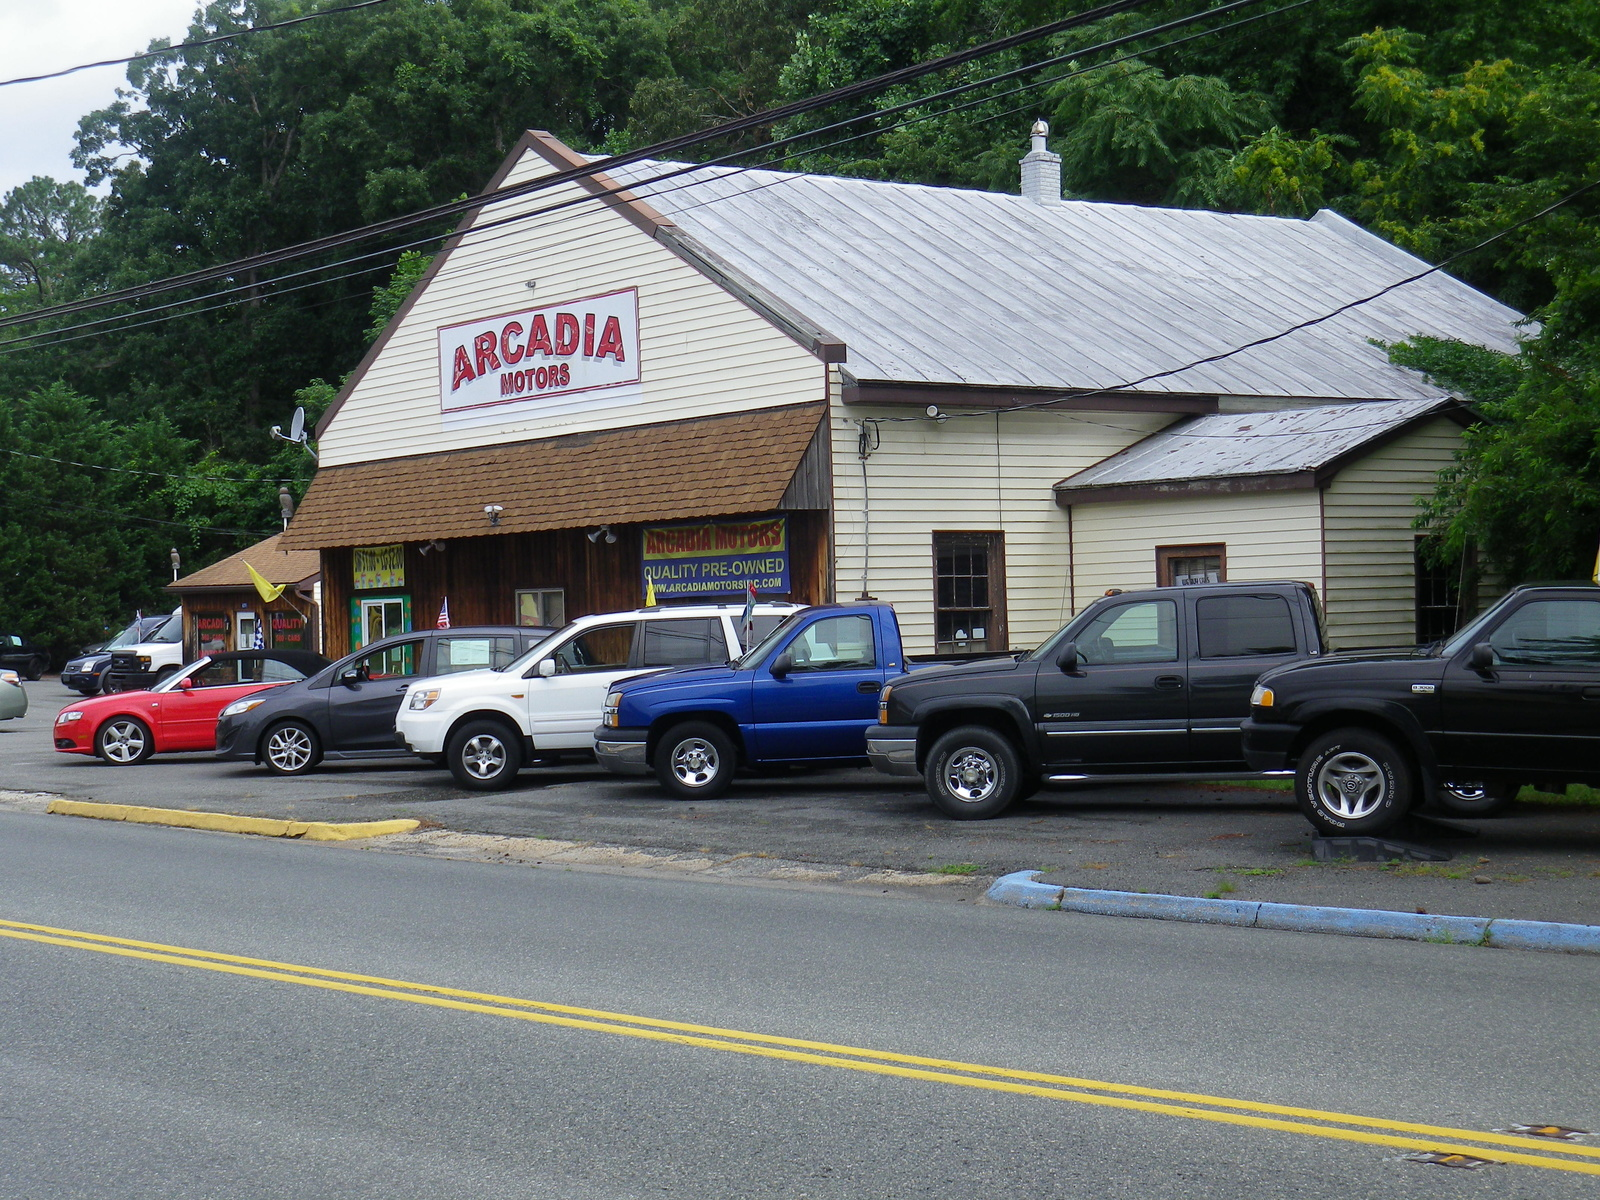 Arcadia Motors Inc - Heathsville, VA: Read Consumer ...